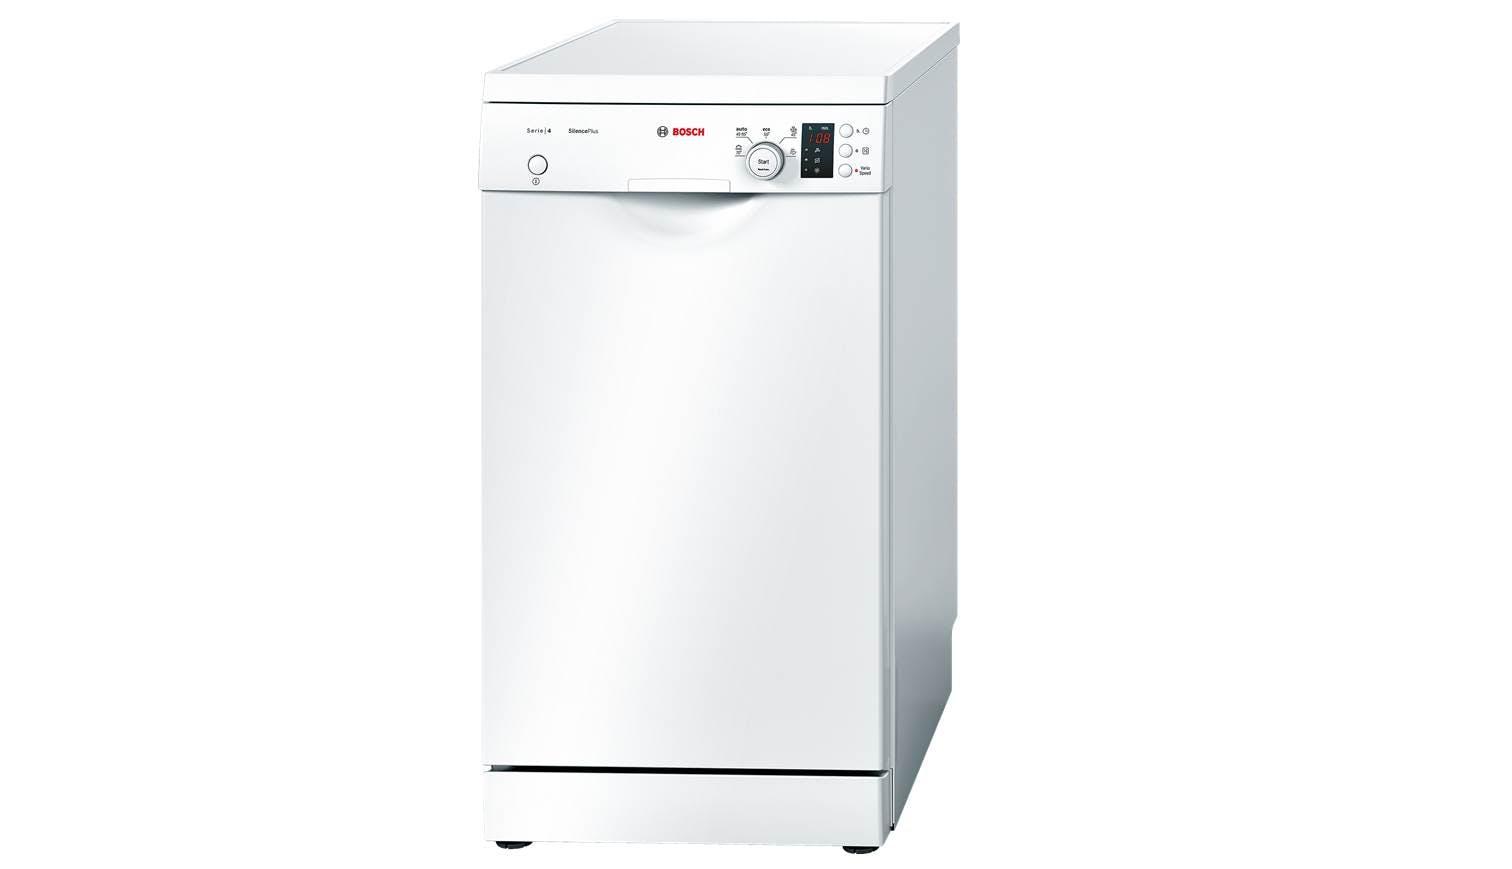 Bosch Sps 50e82eu 45cm Dishwasher Harvey Norman Singapore